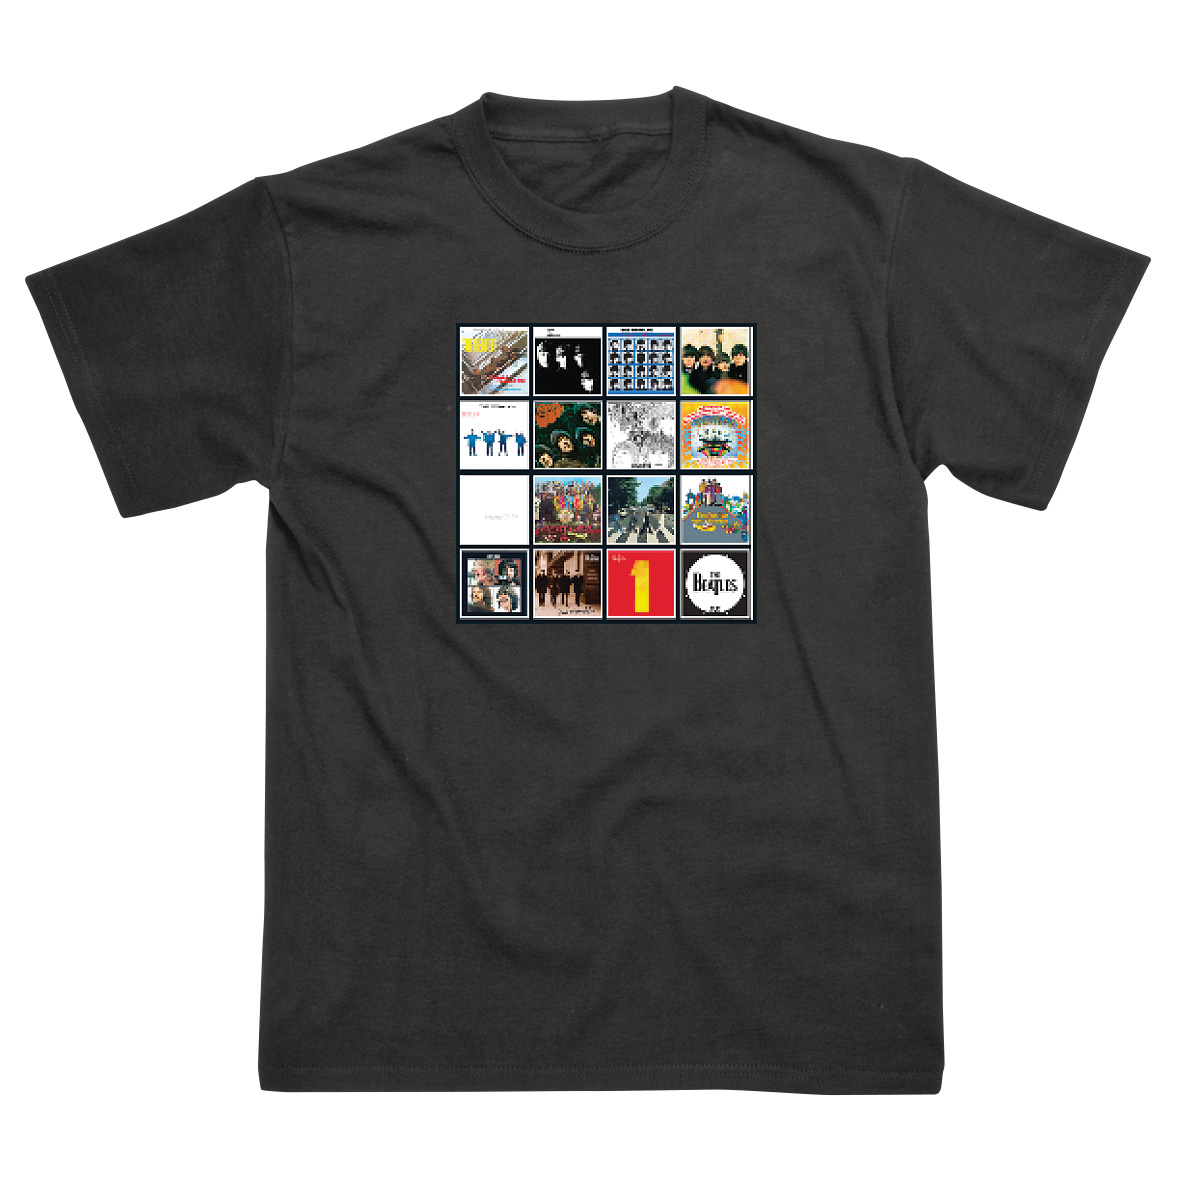 The Beatles Album Covers T-Shirt - S